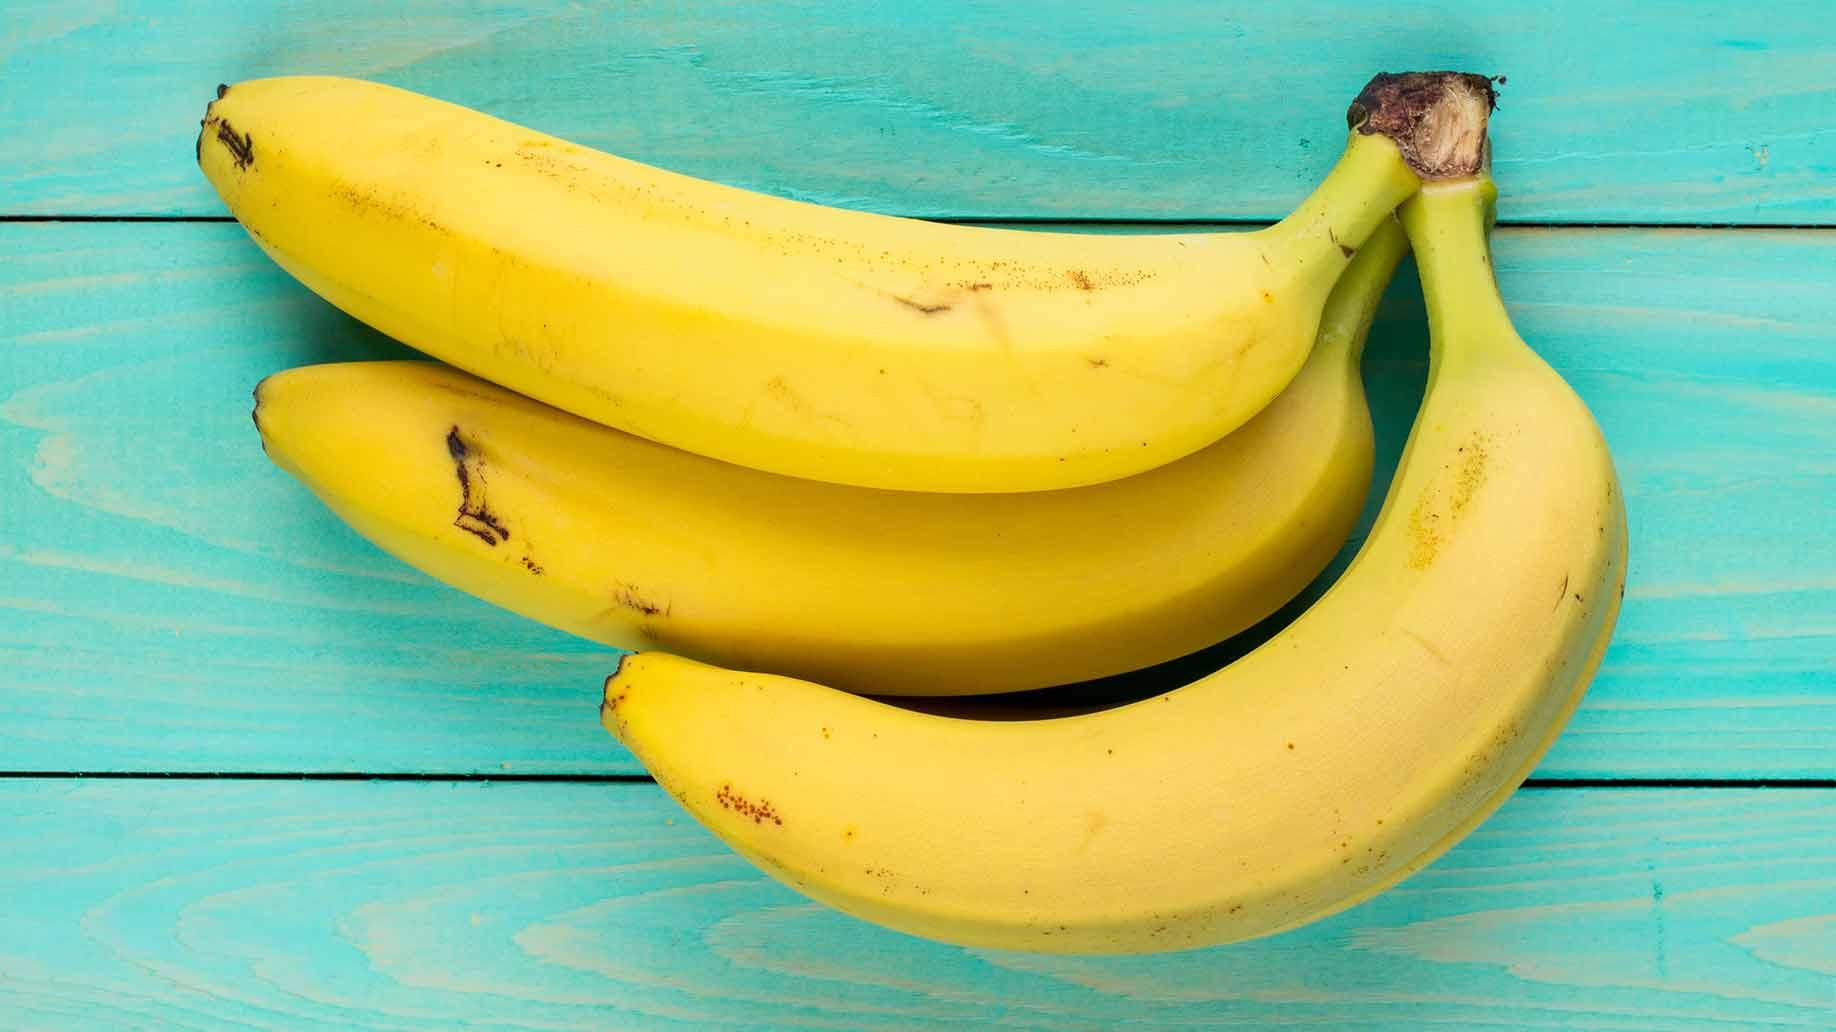 ripe yellow bananas batch teal background